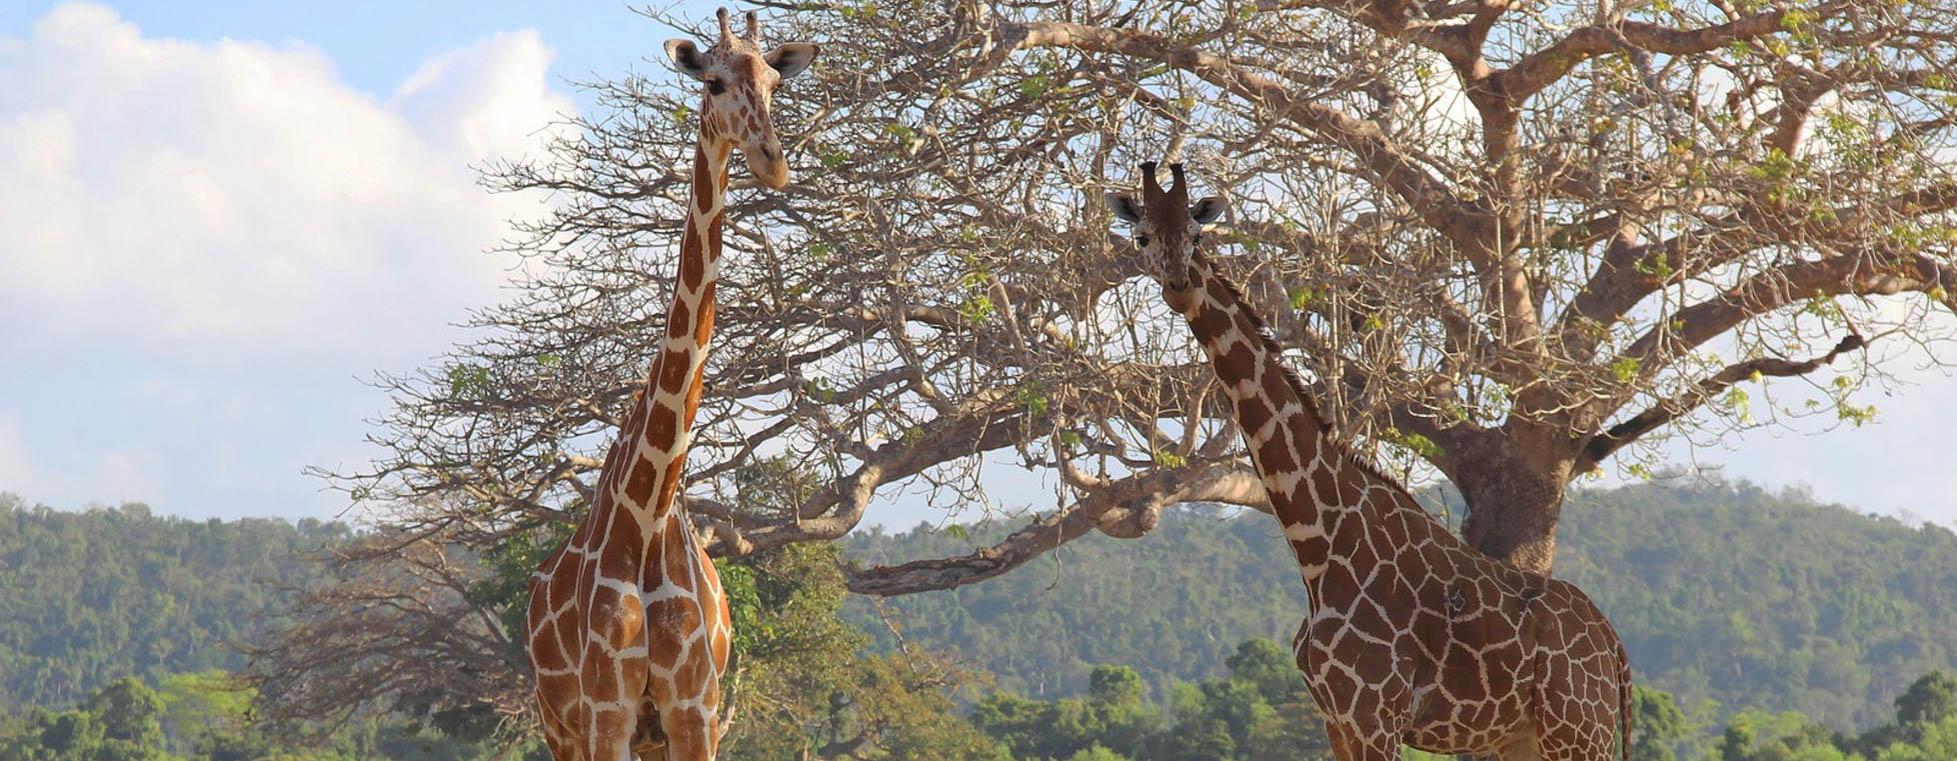 Calauit Safari Coron Full-Day Tour | With Buffet Lunch & Transfers